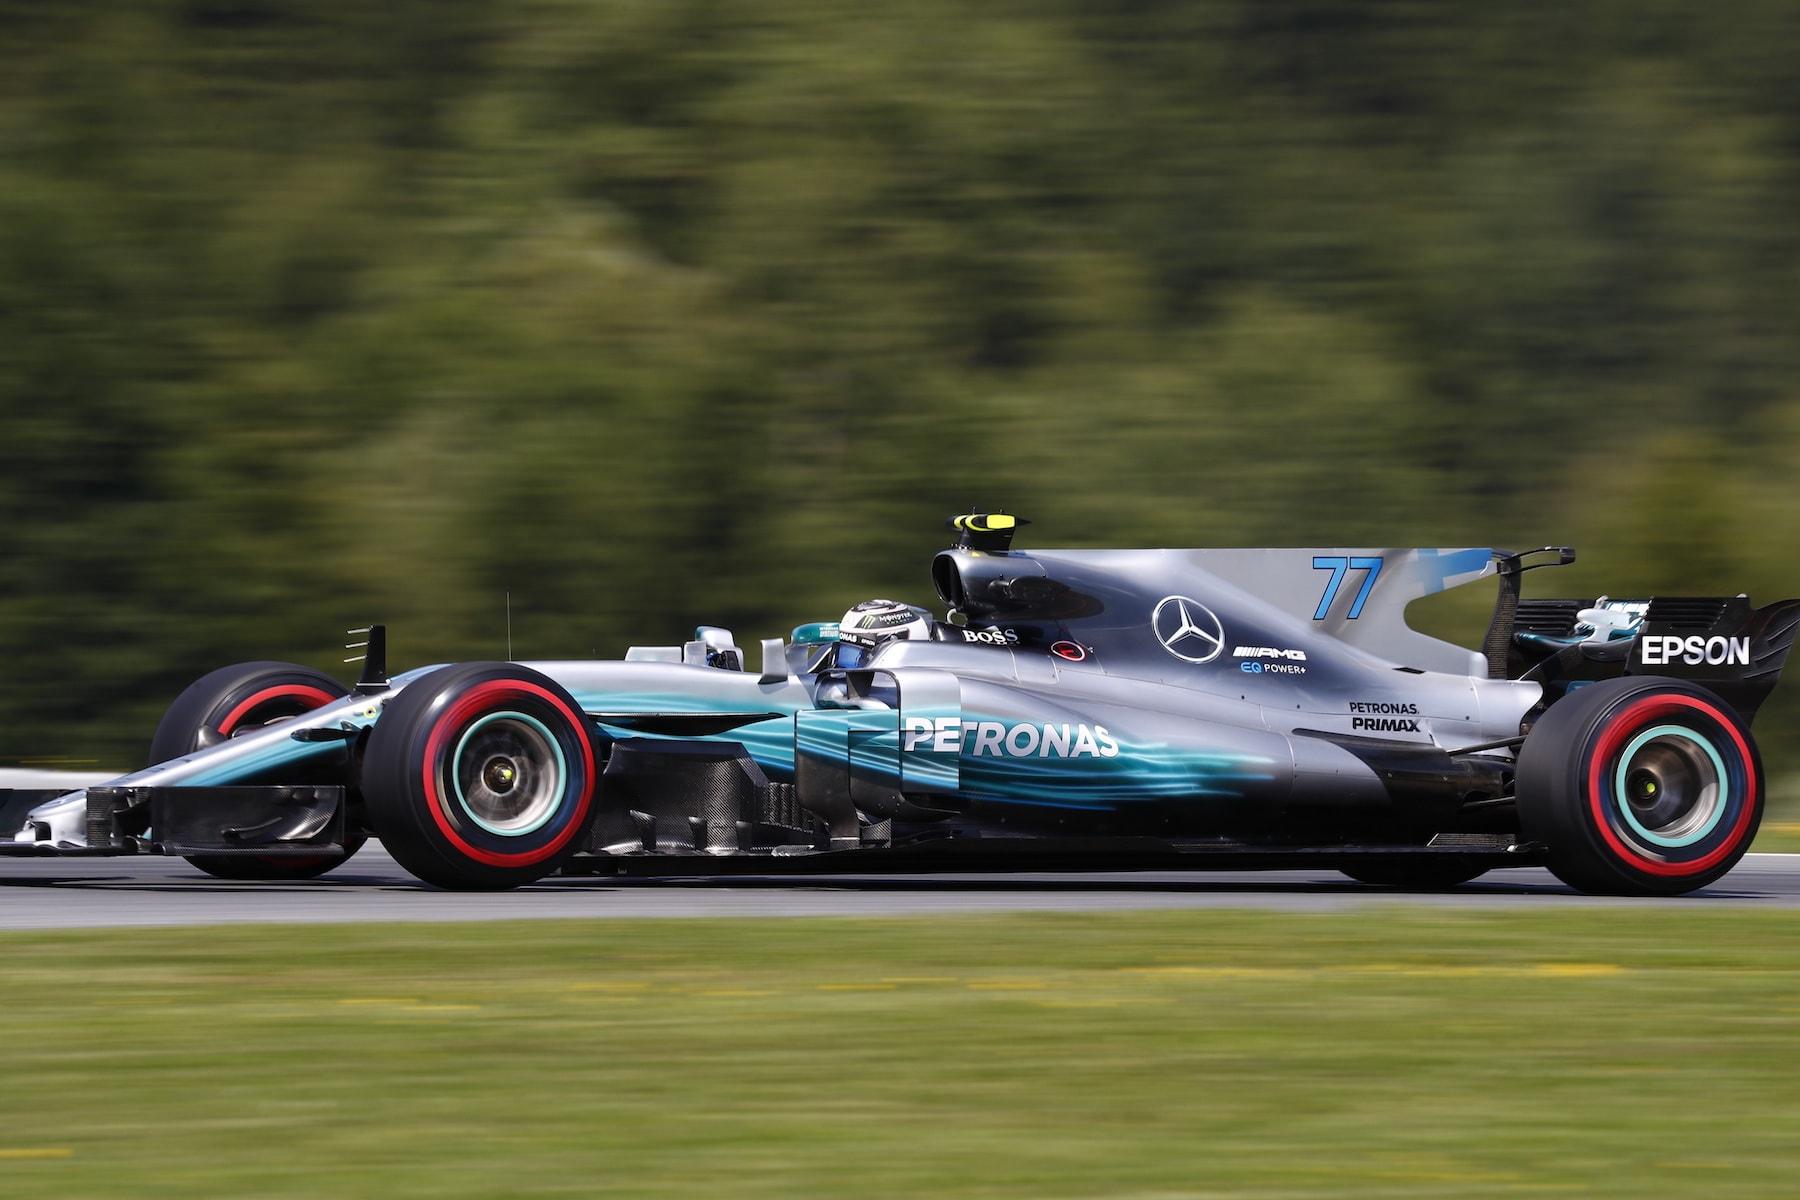 2017 Valtteri Bottas | Mercedes W08 | 2017 Austrian GP P1 2 copy.JPG